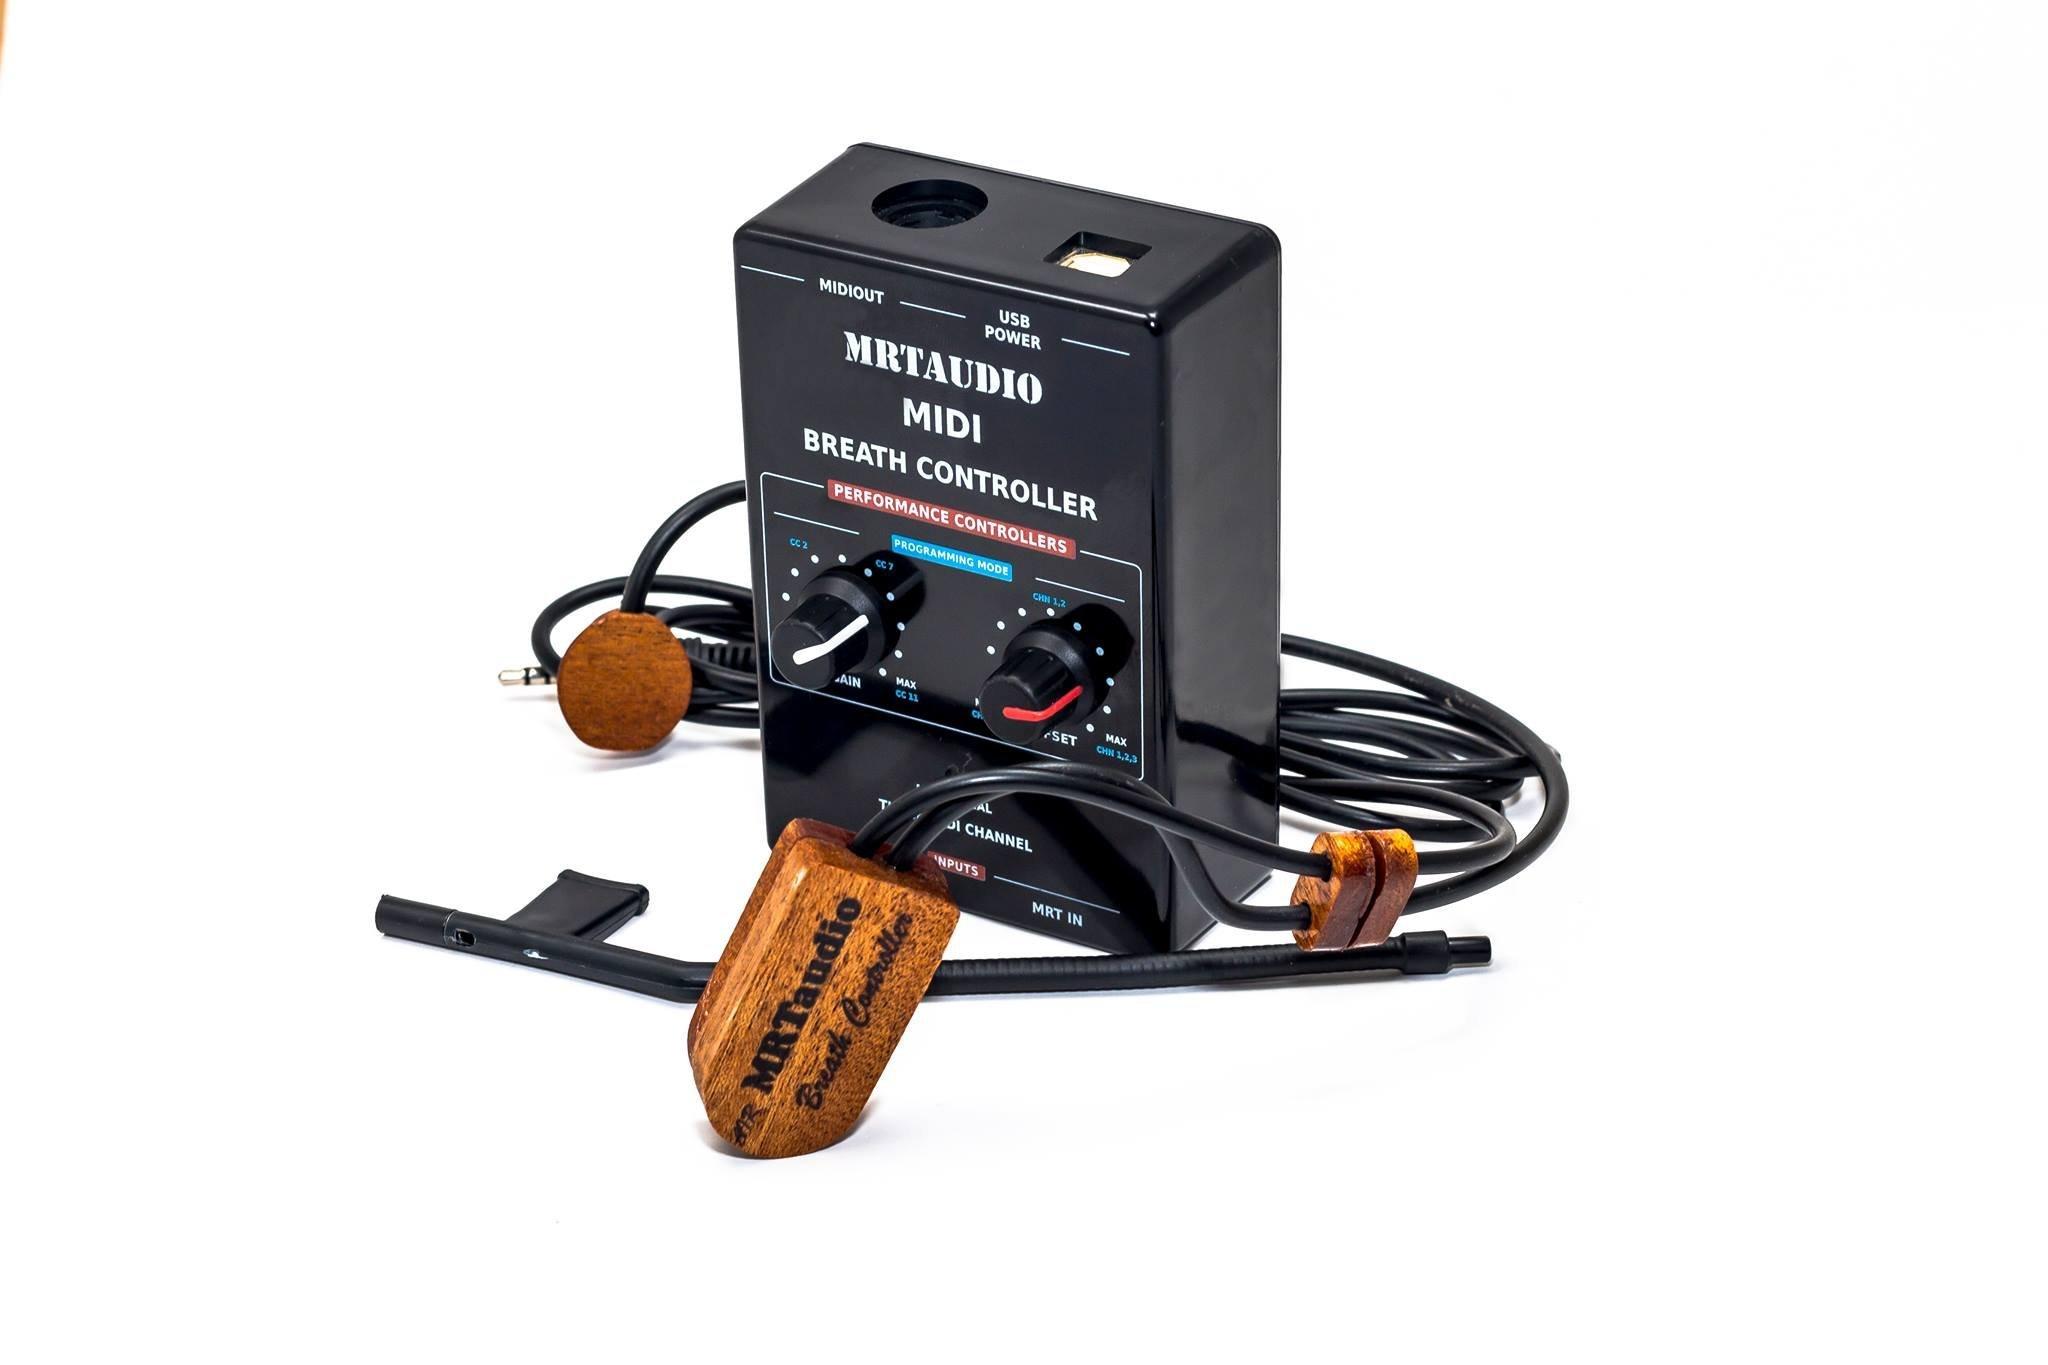 Mrtaudio Midi Breath Controller v2 for Yamaha bc3a by Mrtaudio (Image #9)